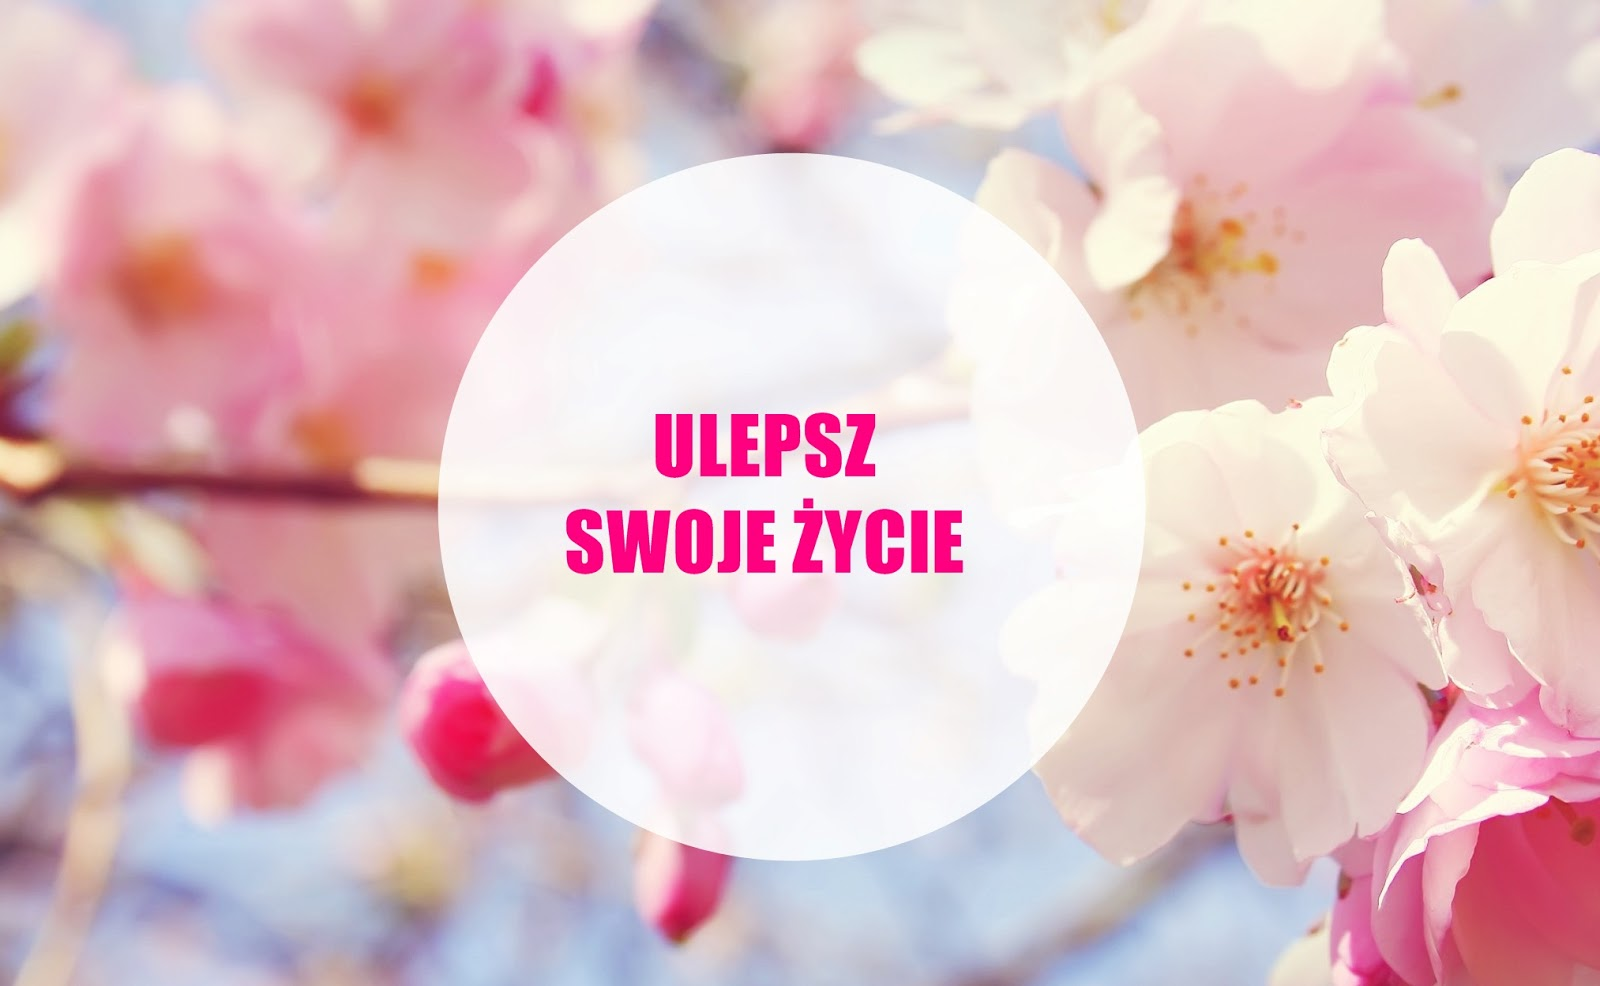 http://1.bp.blogspot.com/-YU8bYYRZlyw/UZtew2RAvYI/AAAAAAAAASM/-3gL5ovRm4k/s1600/pink-flowers-wallpaper.jpg